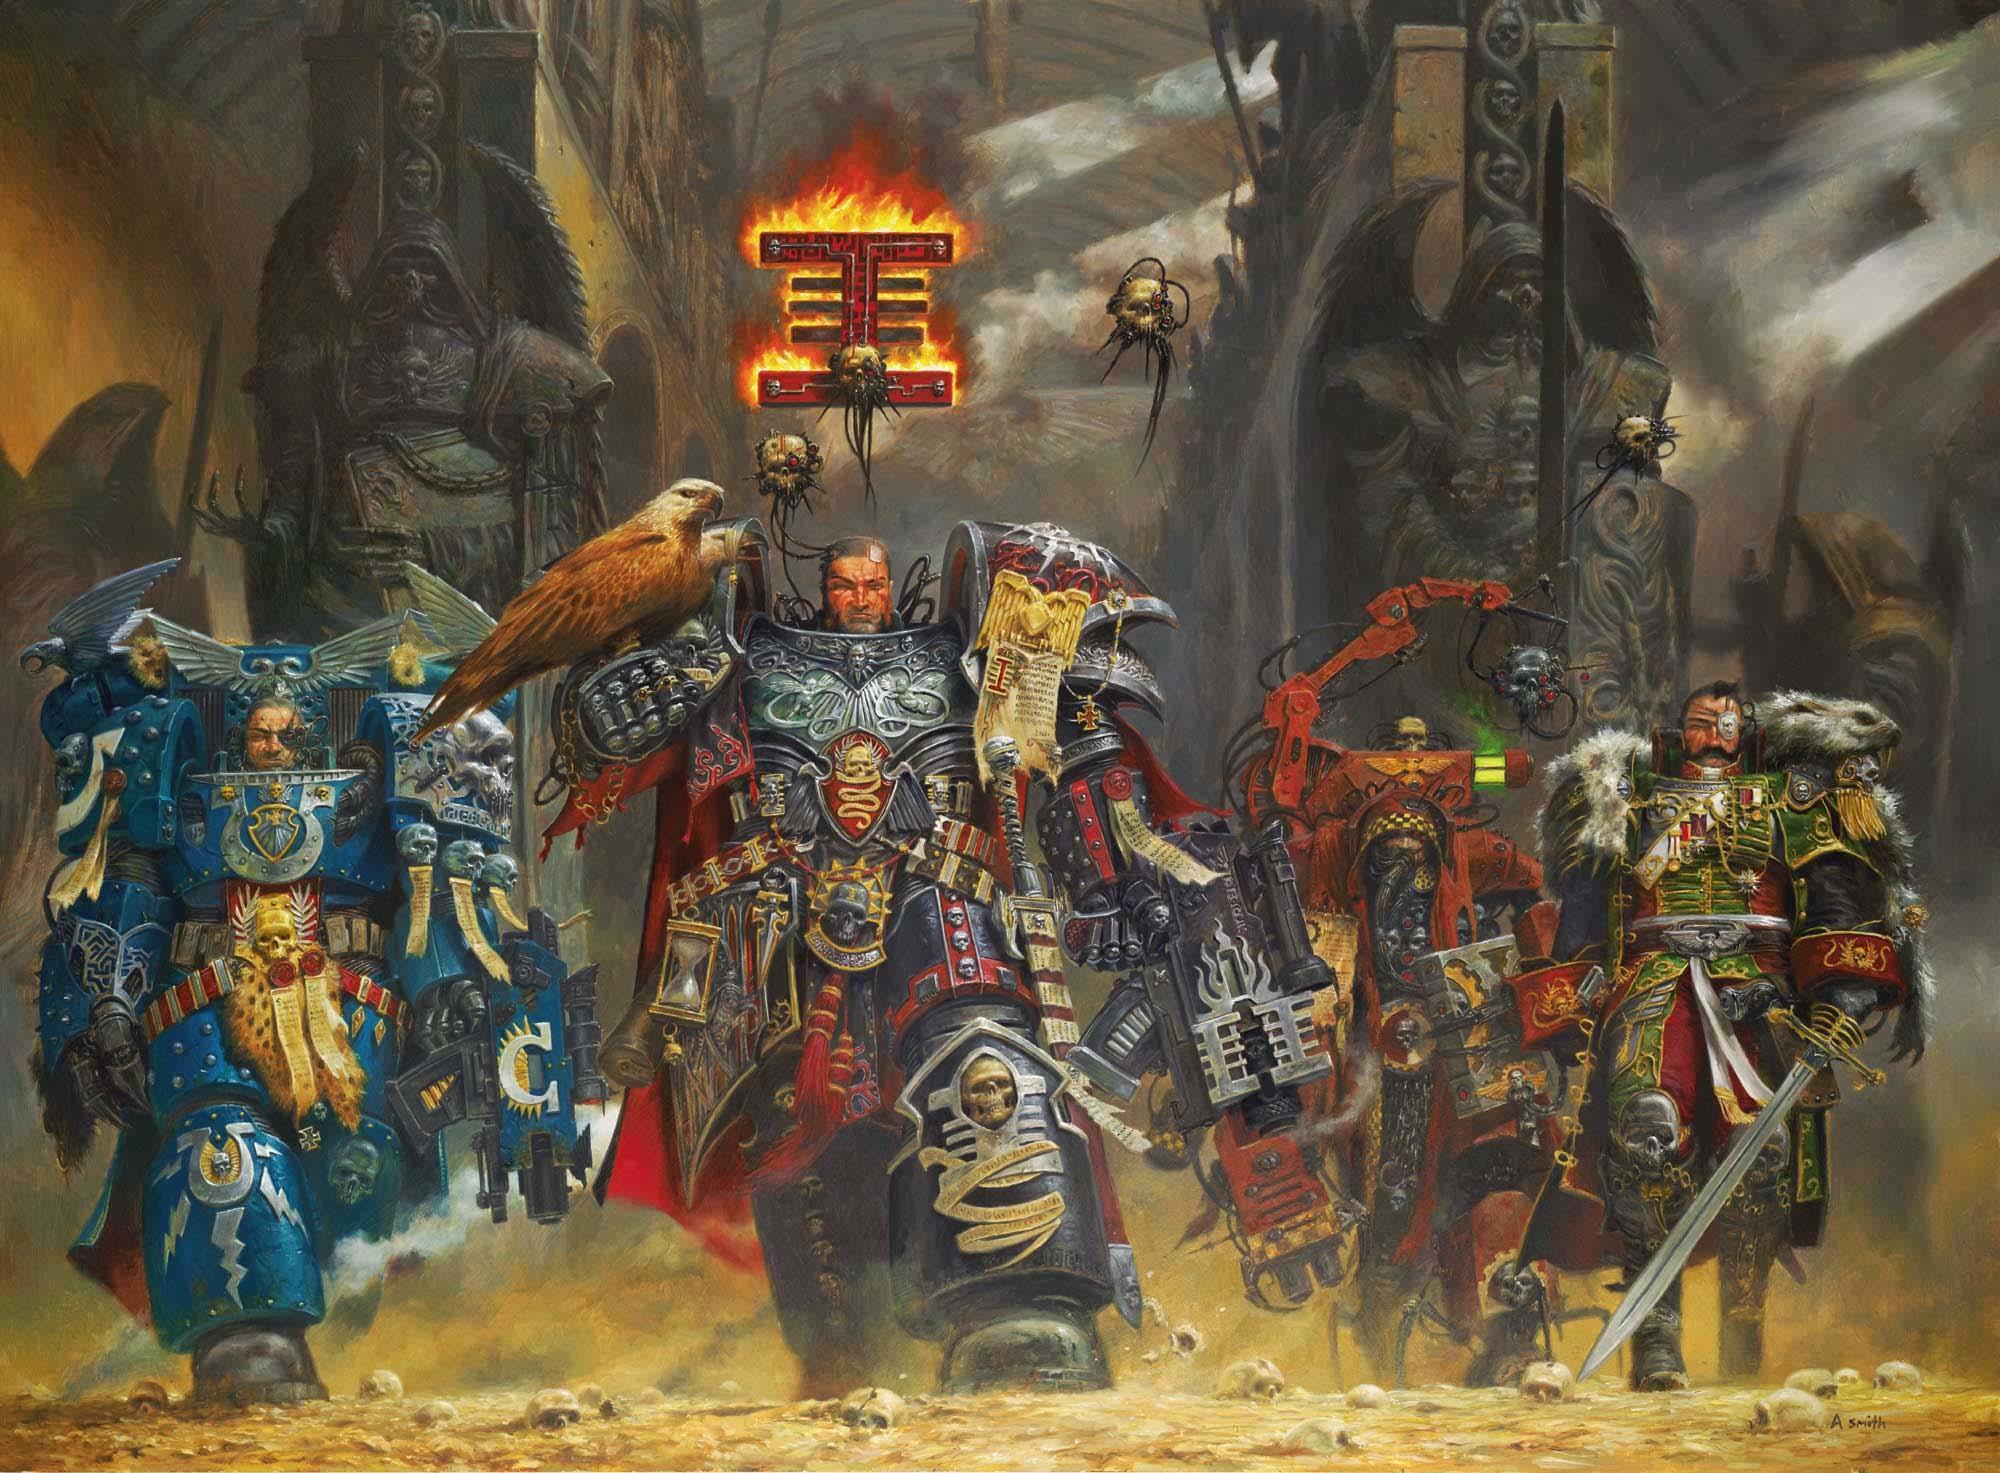 The Inquisition warhammer